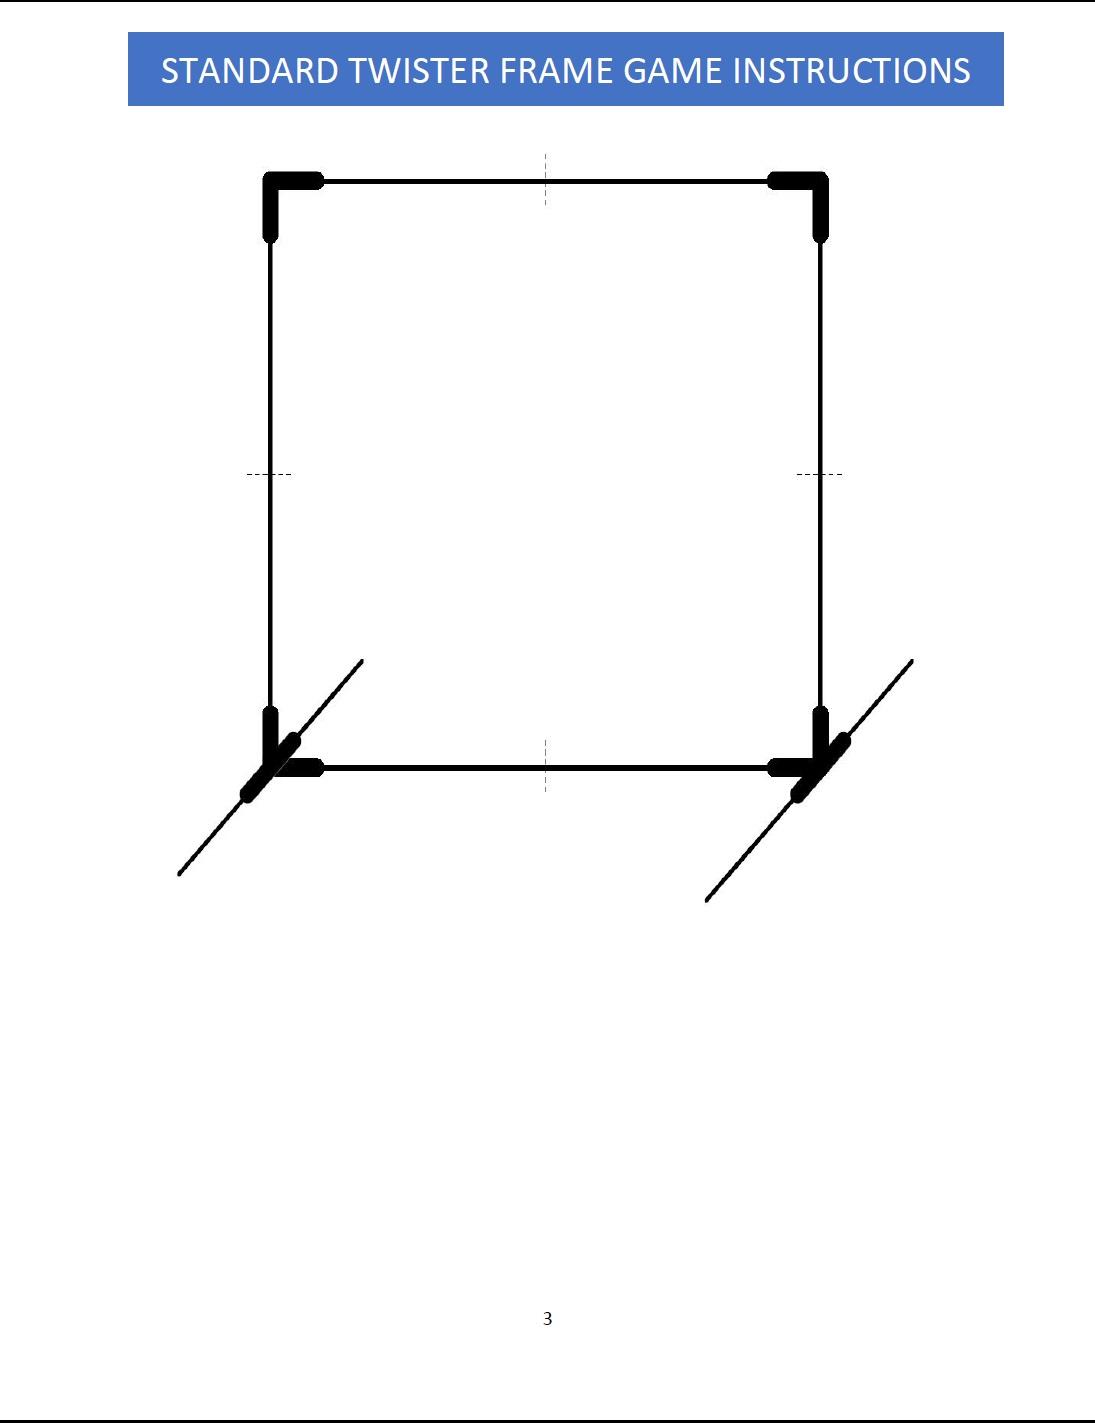 standard-twister-frame-game-instructions-page-3.jpg